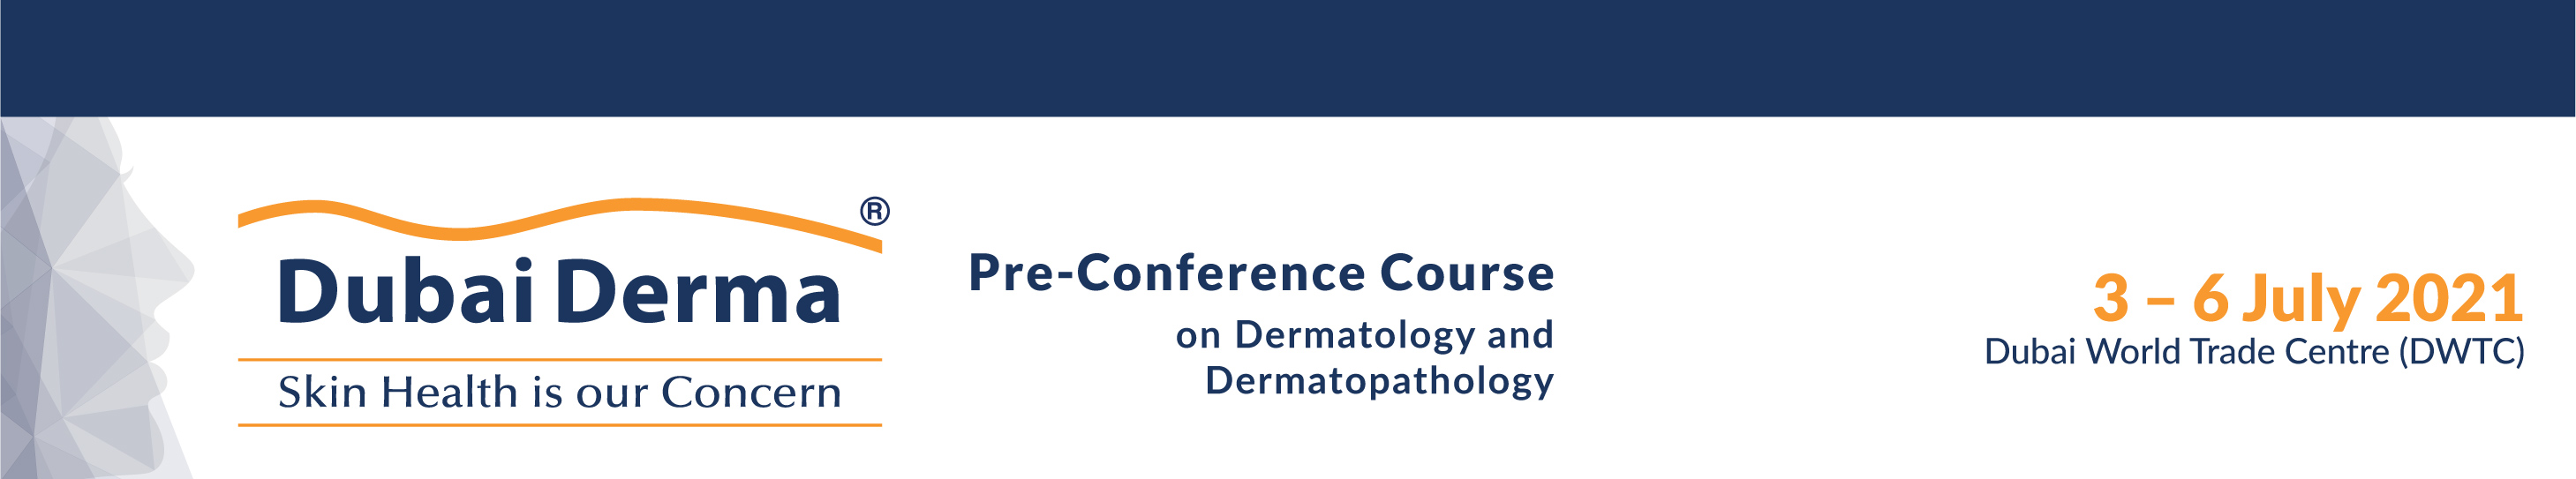 Pre-Conference Dermatology & Dermatopathology Course